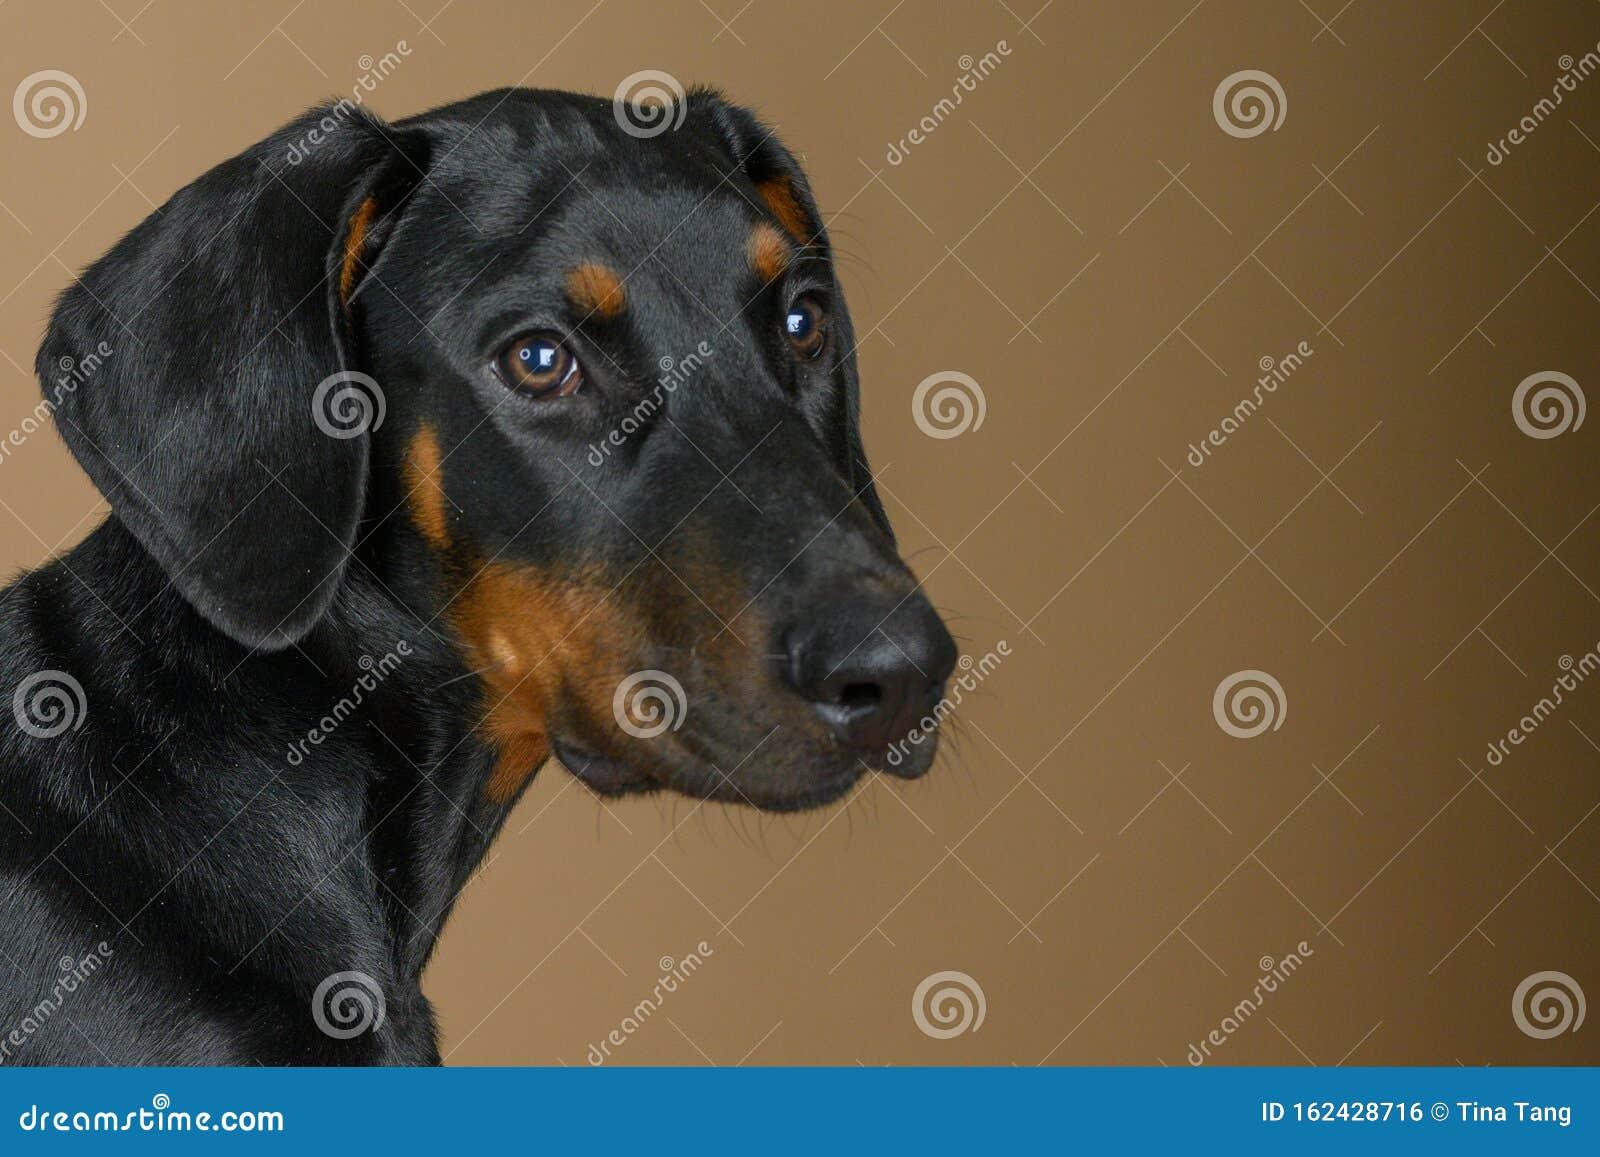 Cute Doberman Pinscher Puppy Head Portrait Stock Photo Image Of Mans Puppy 162428716